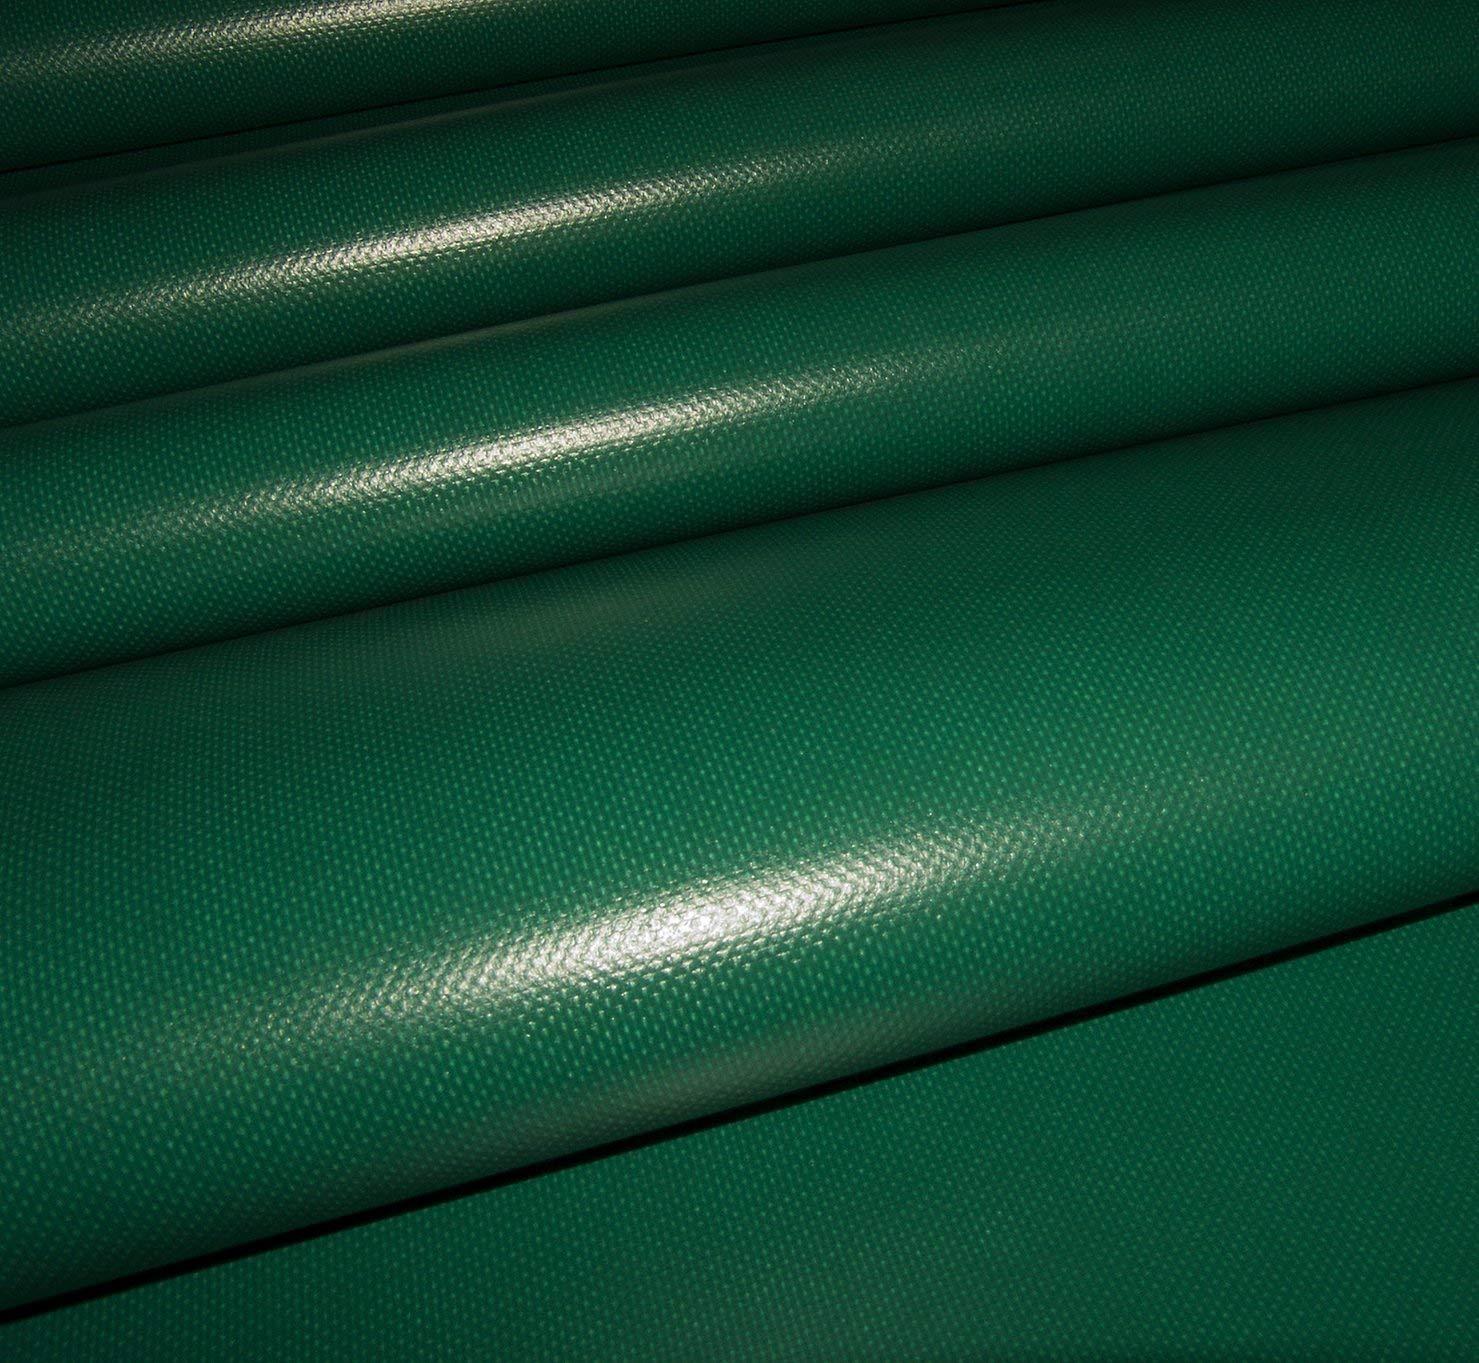 c190bf4127 Green Vinyl Fabric 18 Ounce Heavy Duty — Northwest Tarp   Canvas